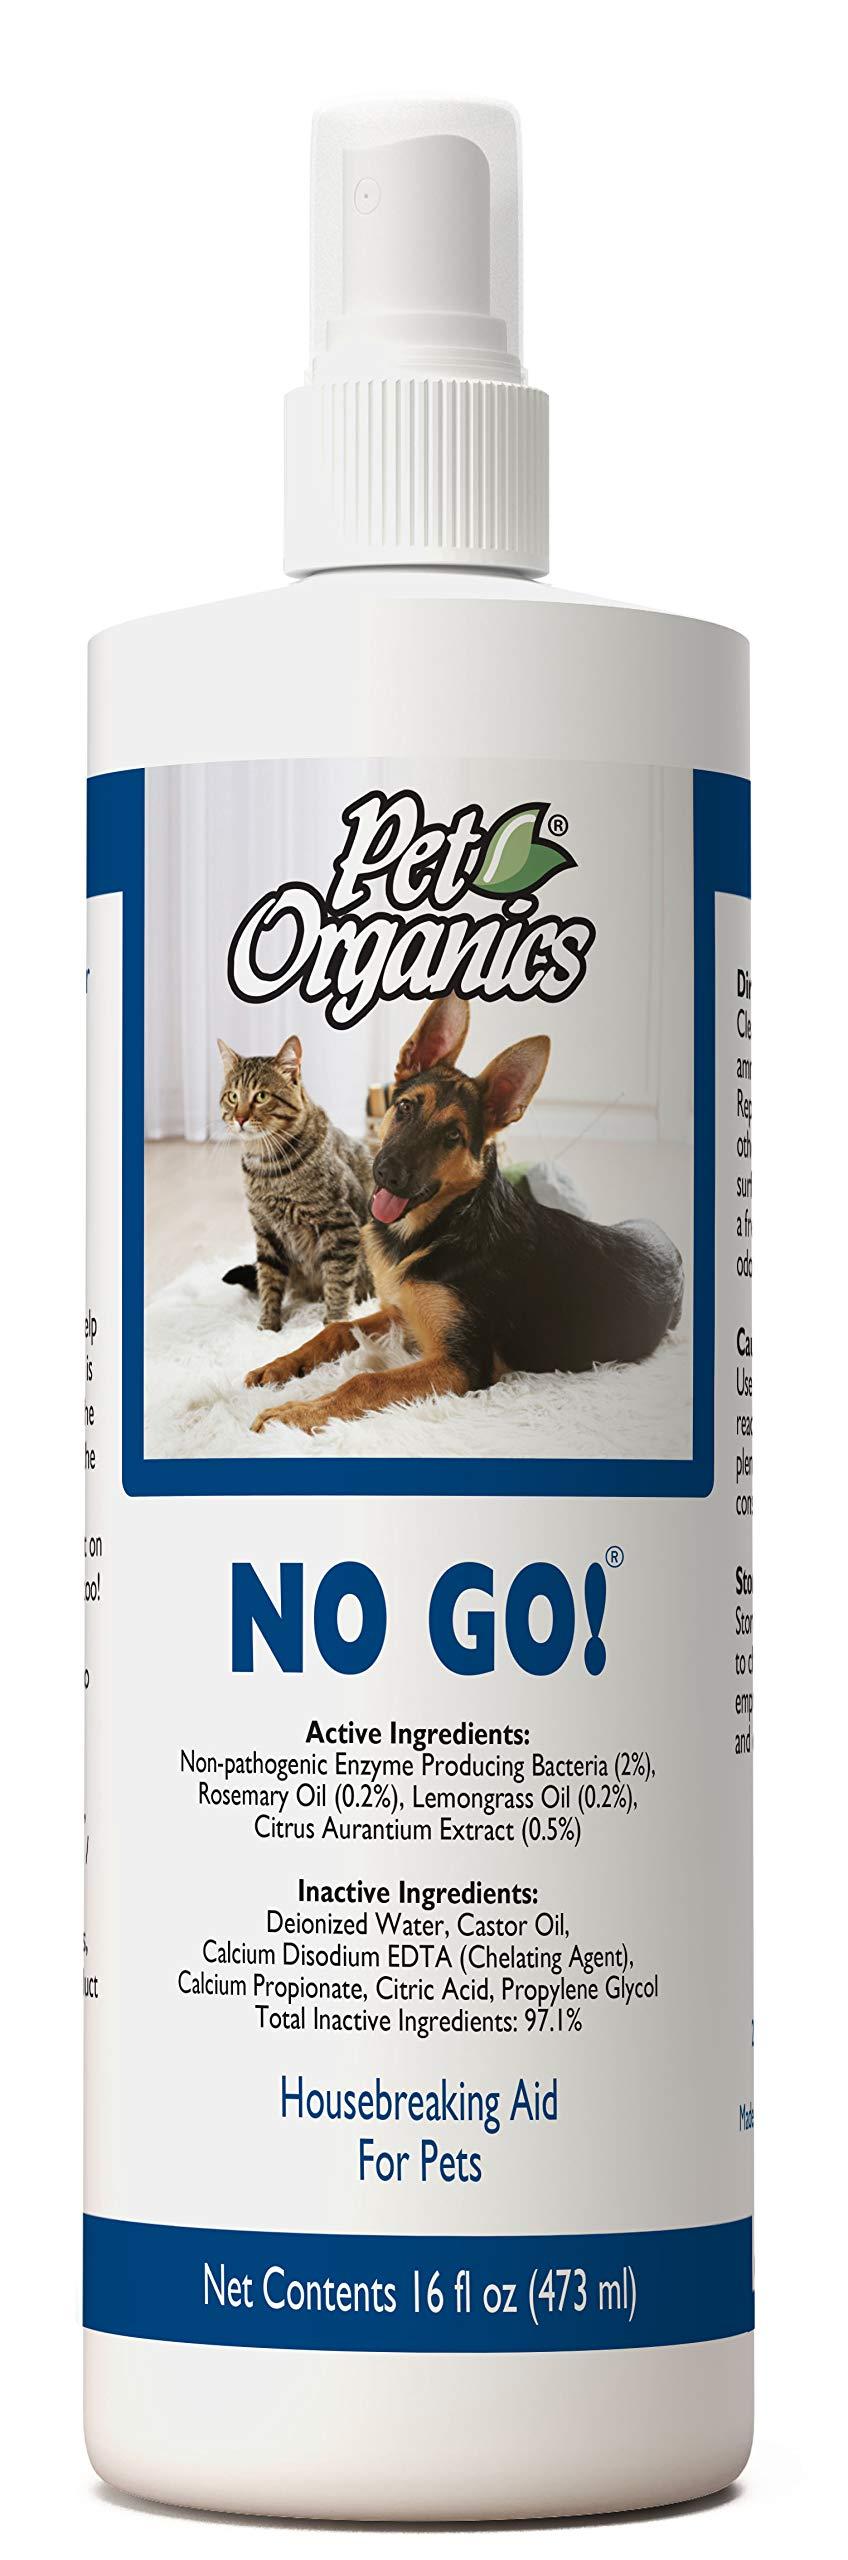 Pet Organics No Go!® Spray - 16 fl oz bottle by Pet Organics